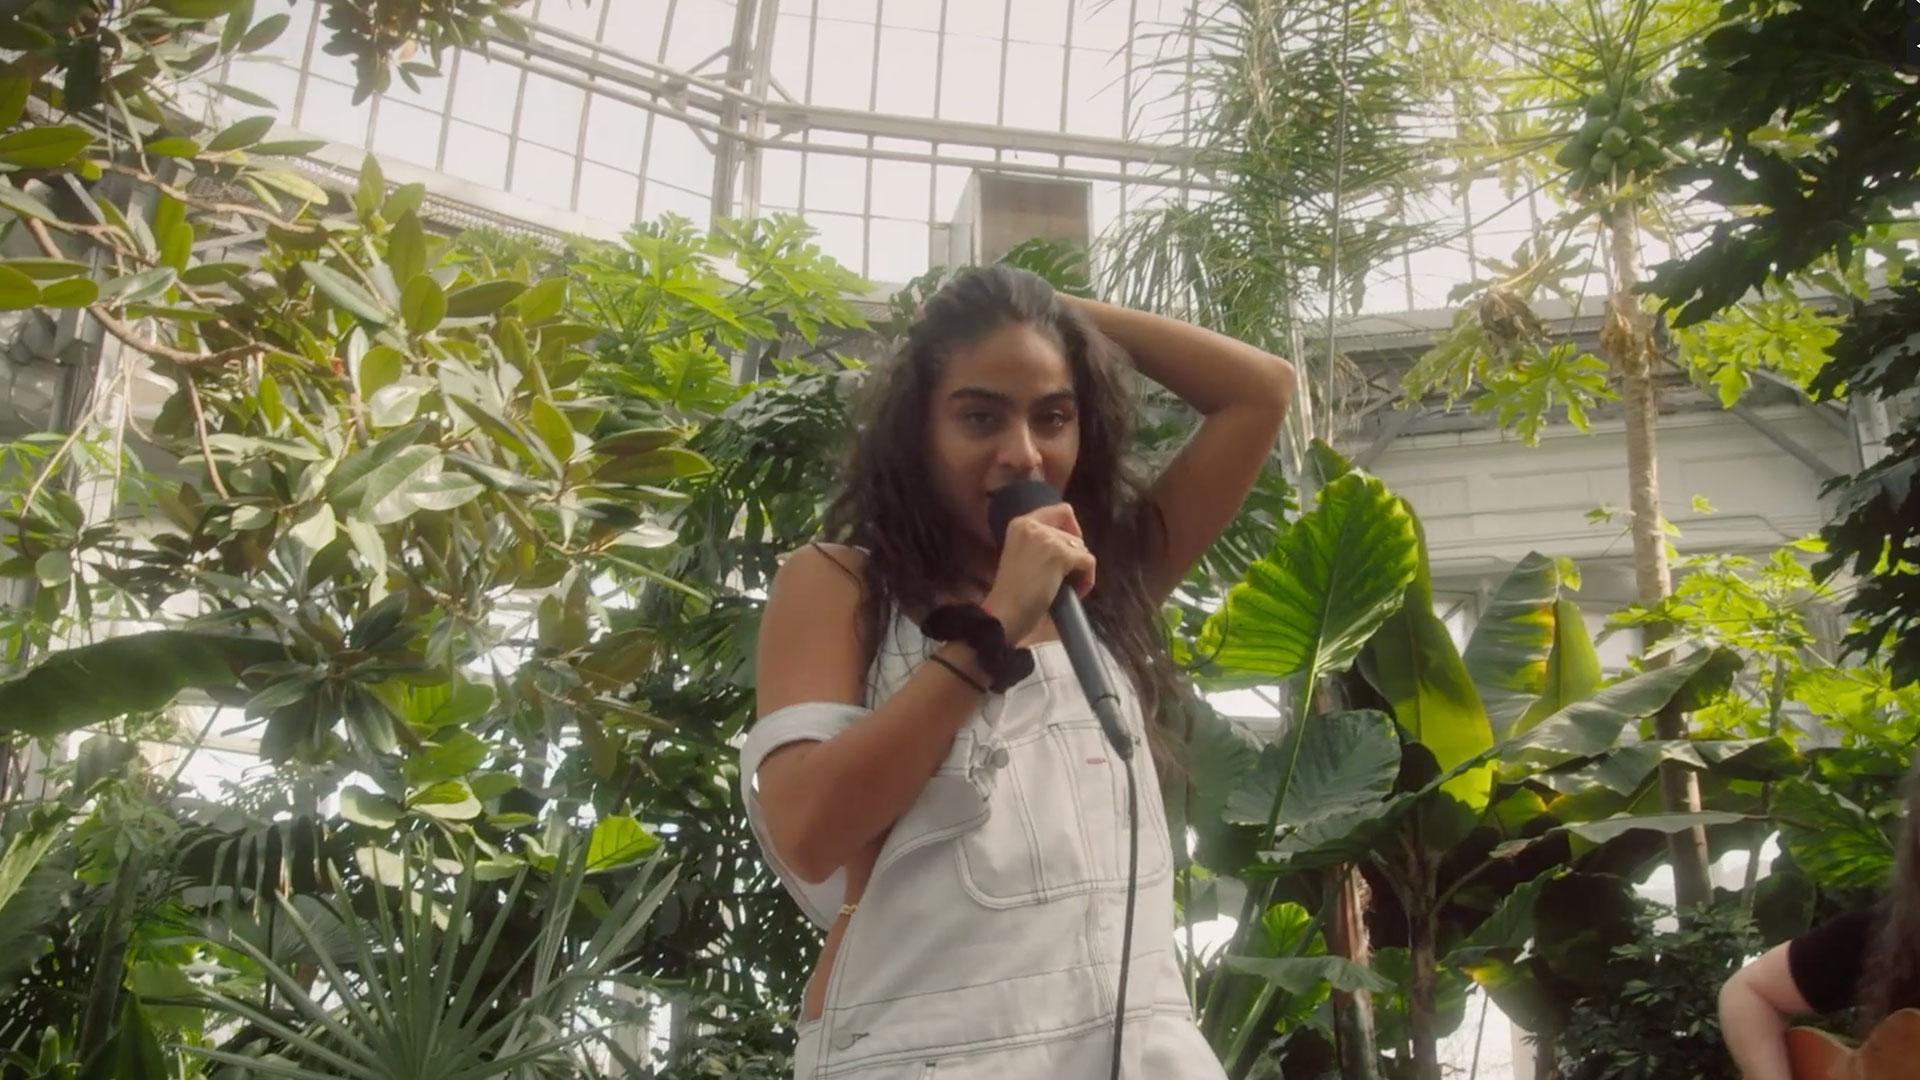 Jessie Reyez singing in front of plants